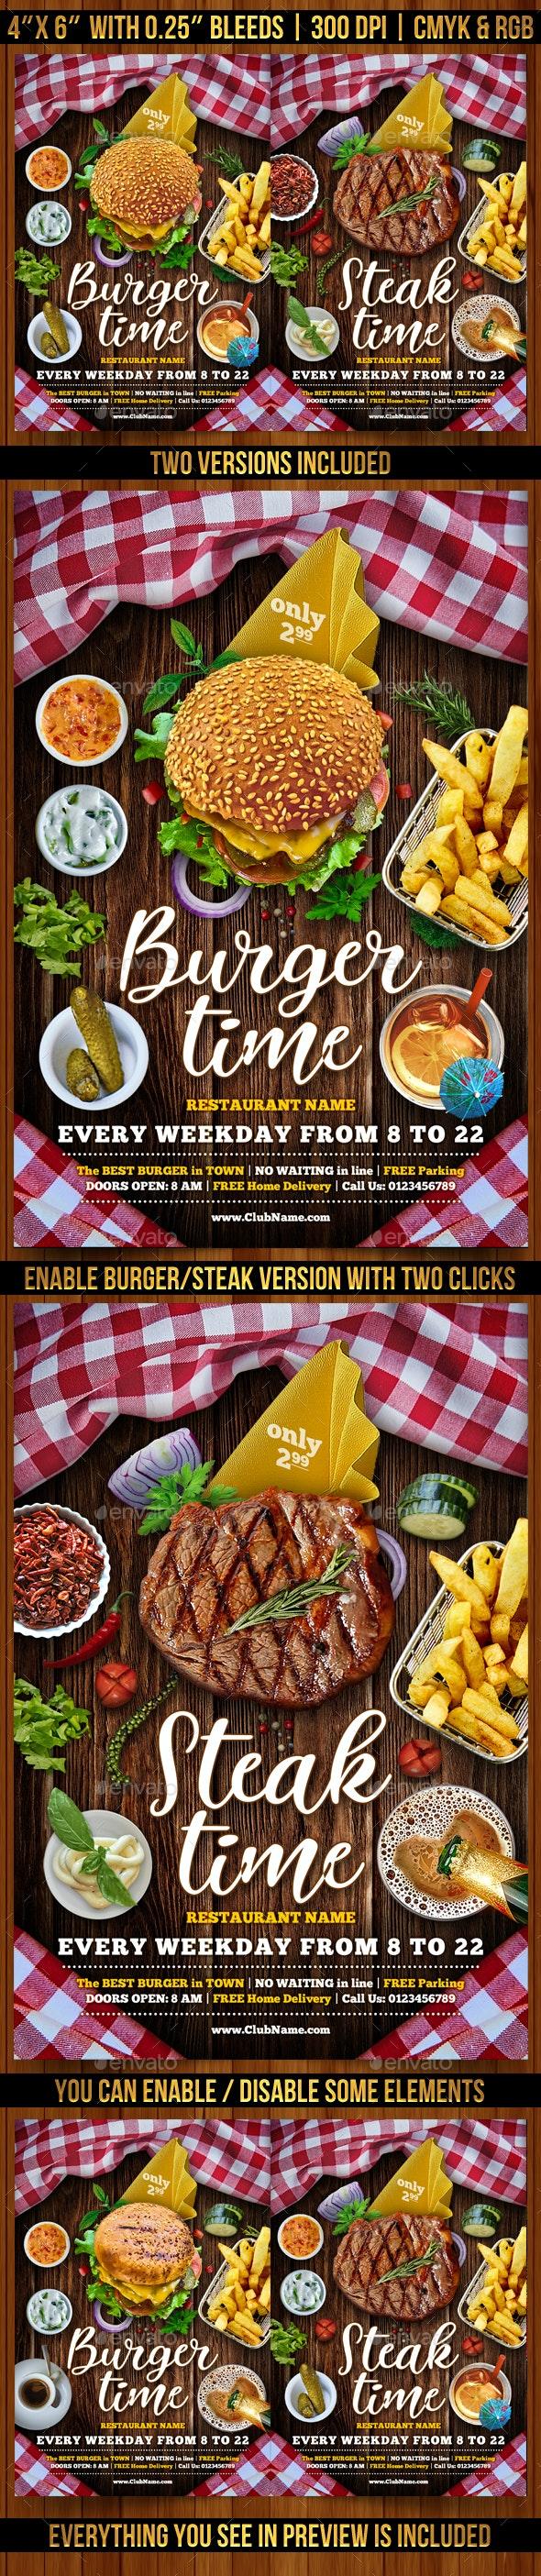 Burger and Steak Flyer Template - Restaurant Flyers